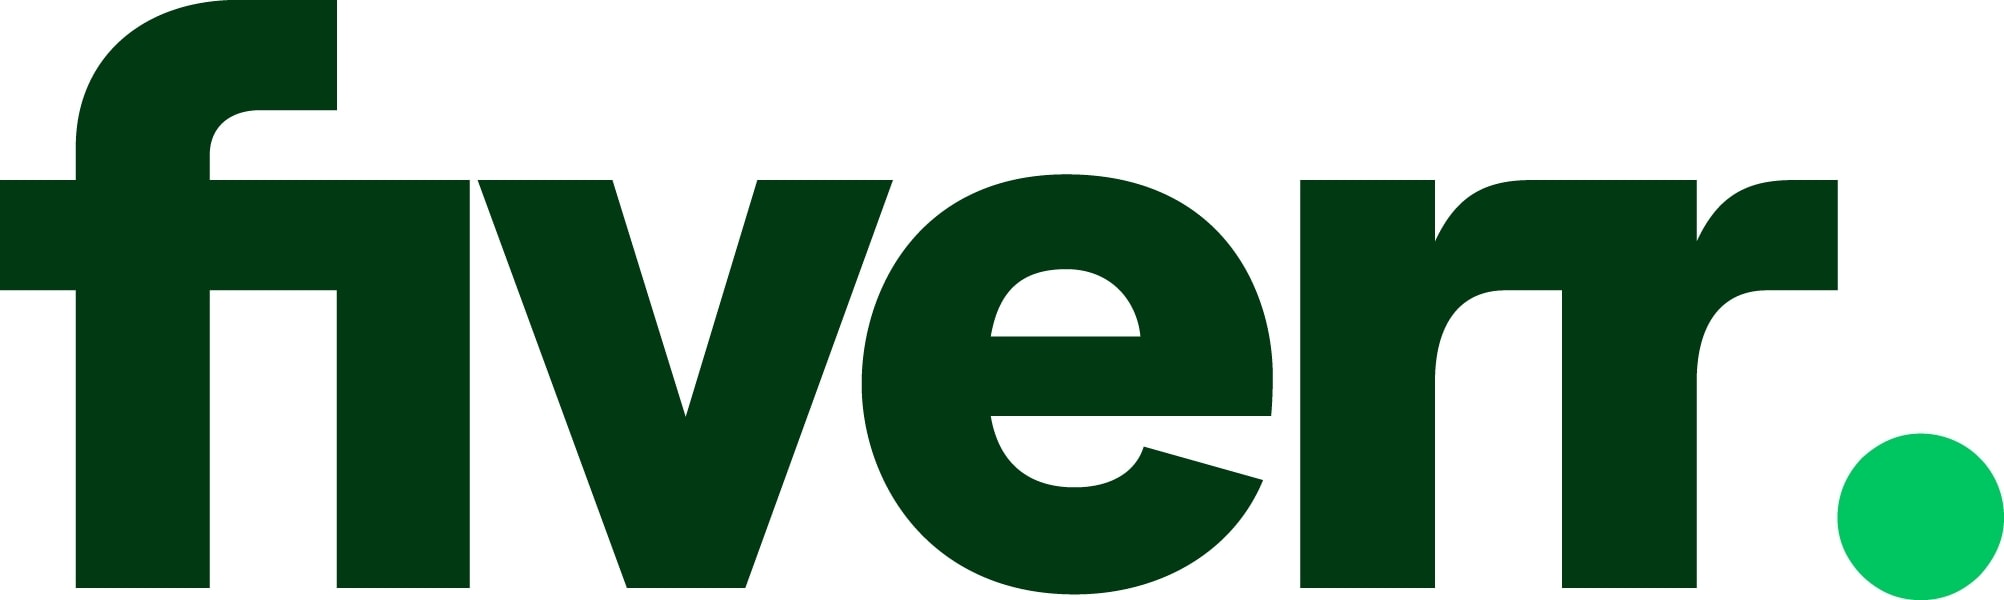 Fiverr Logo GreenGreen RGB